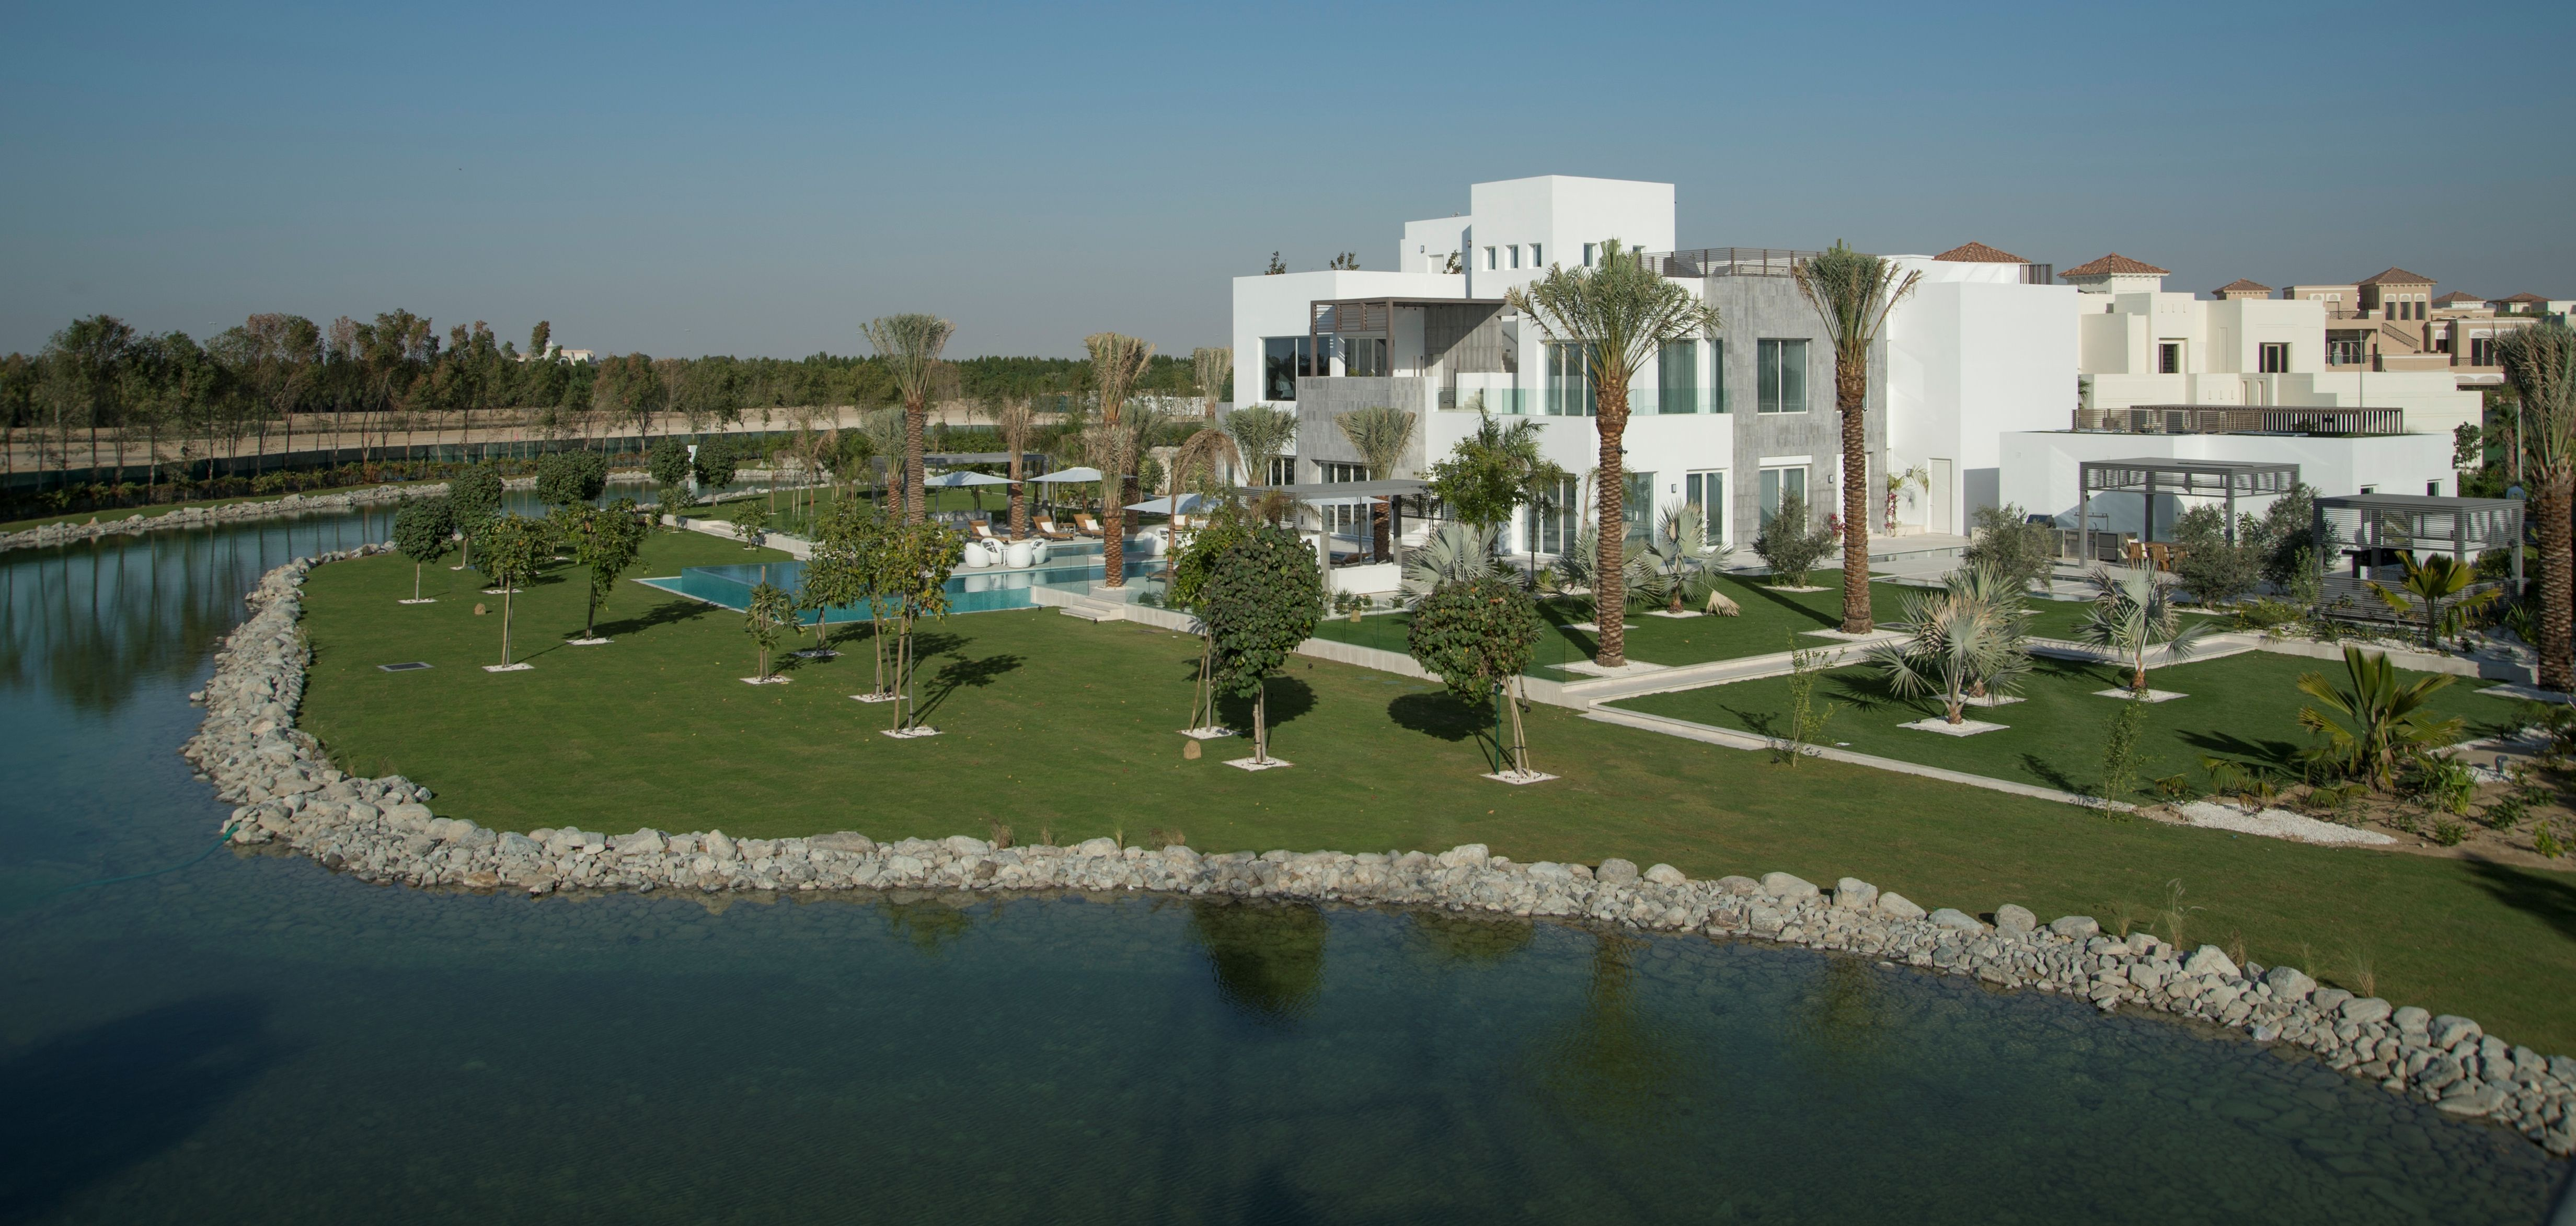 Dubai Residential Communities With Great Views Luxury Homes Dream Houses Apartments In Dubai Dubai